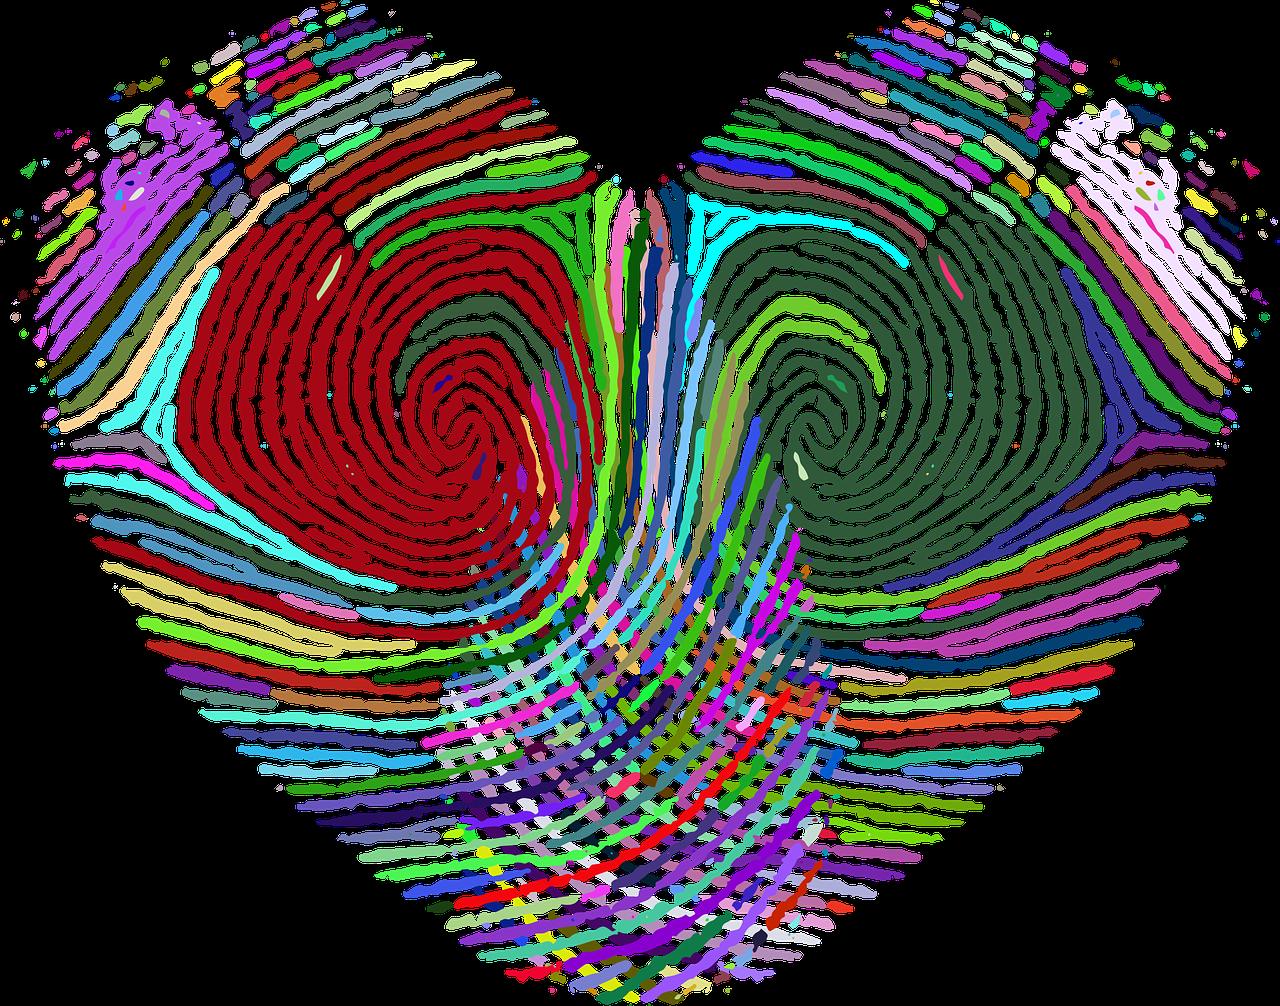 heart-2750395_1280